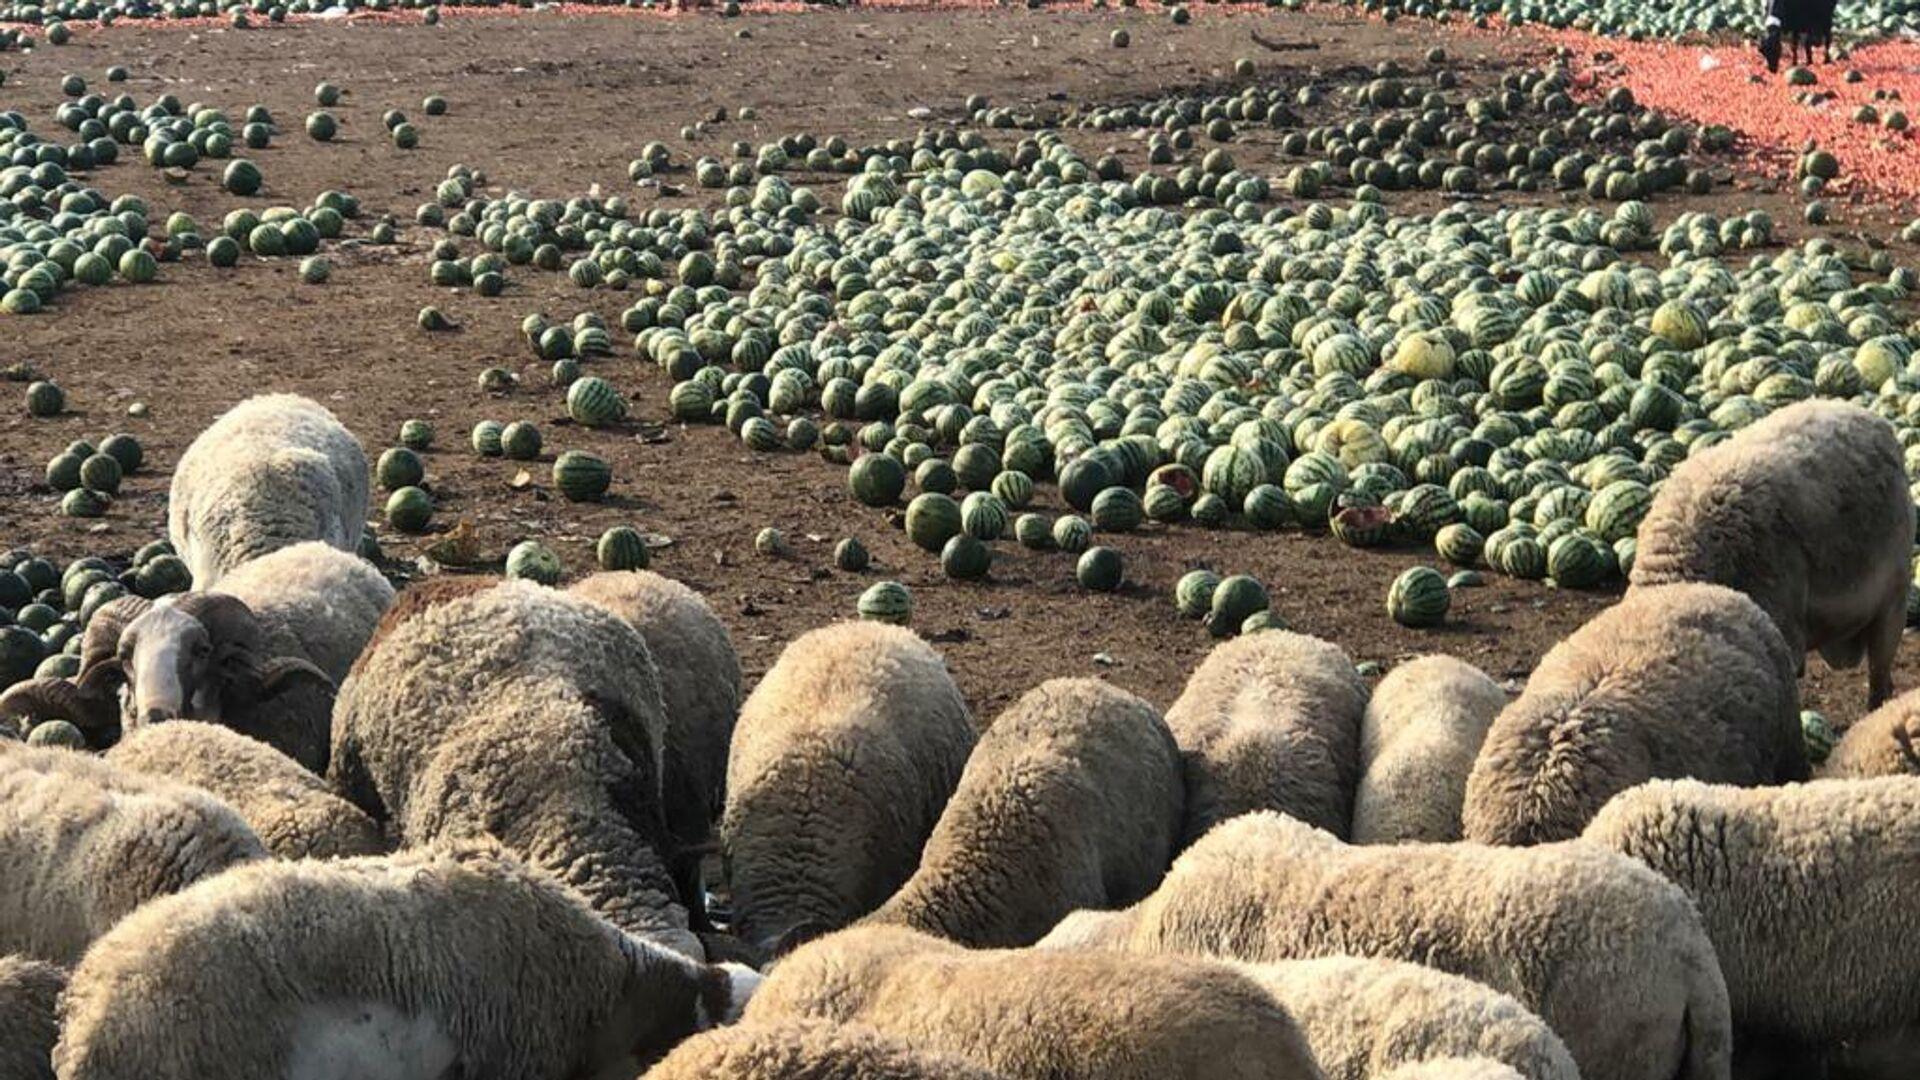 Sandías para las ovejas por precio ruinoso - Sputnik Mundo, 1920, 17.06.2021